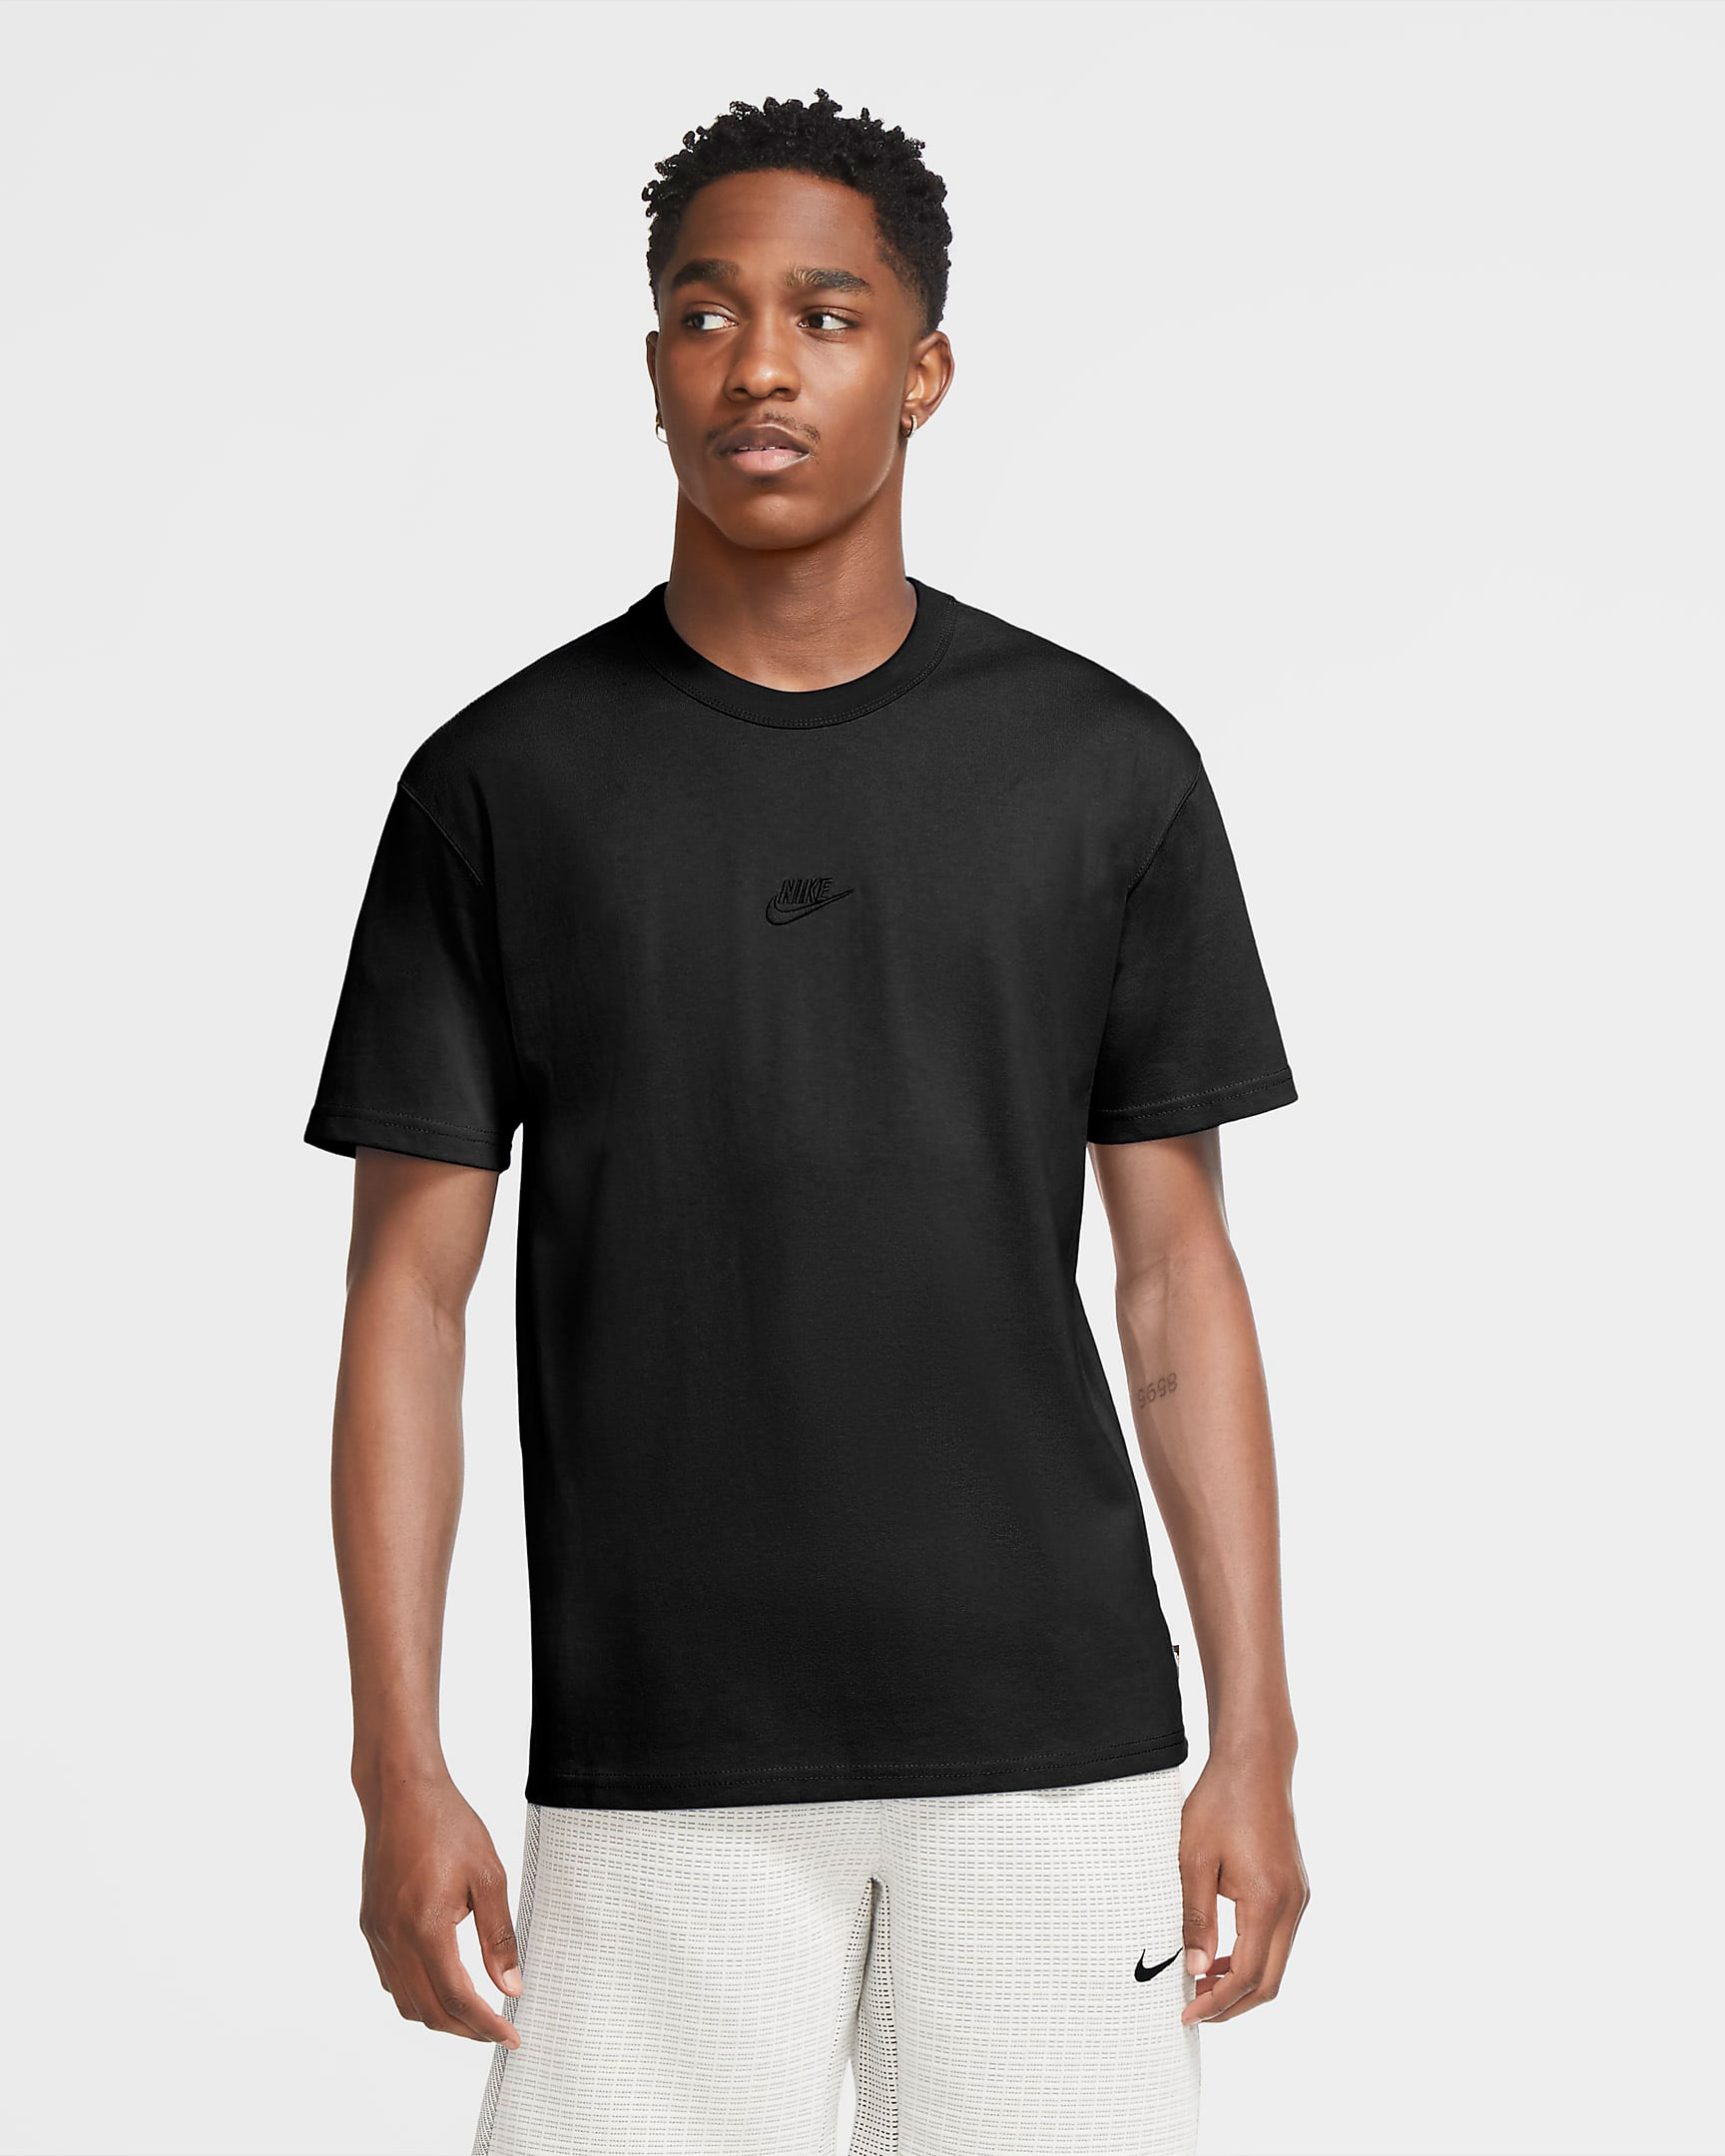 nike-adapt-auto-max-triple-black-tee-shirt